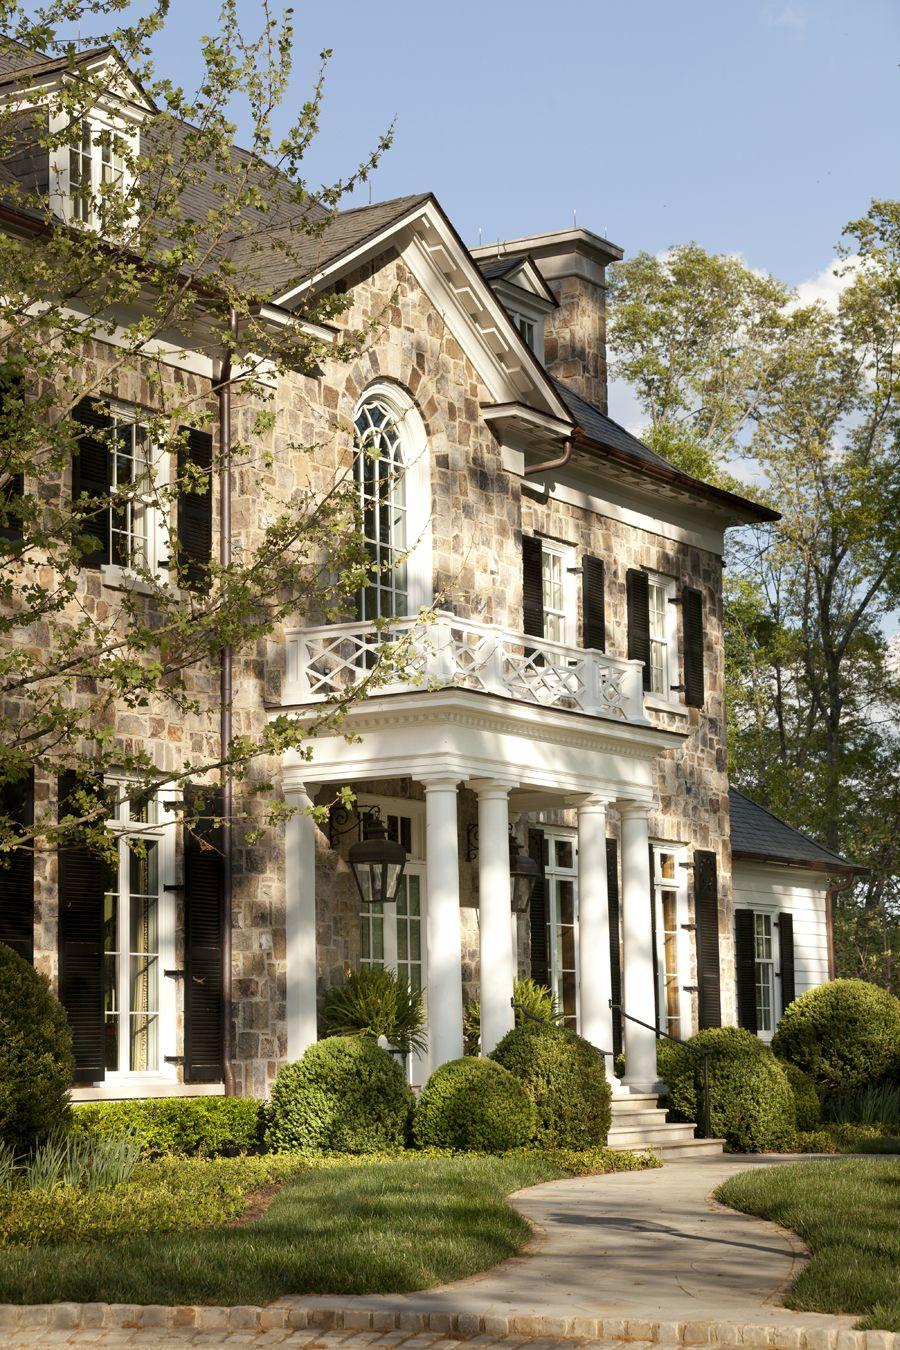 Dream House Exterior Mansions Luxury Castles